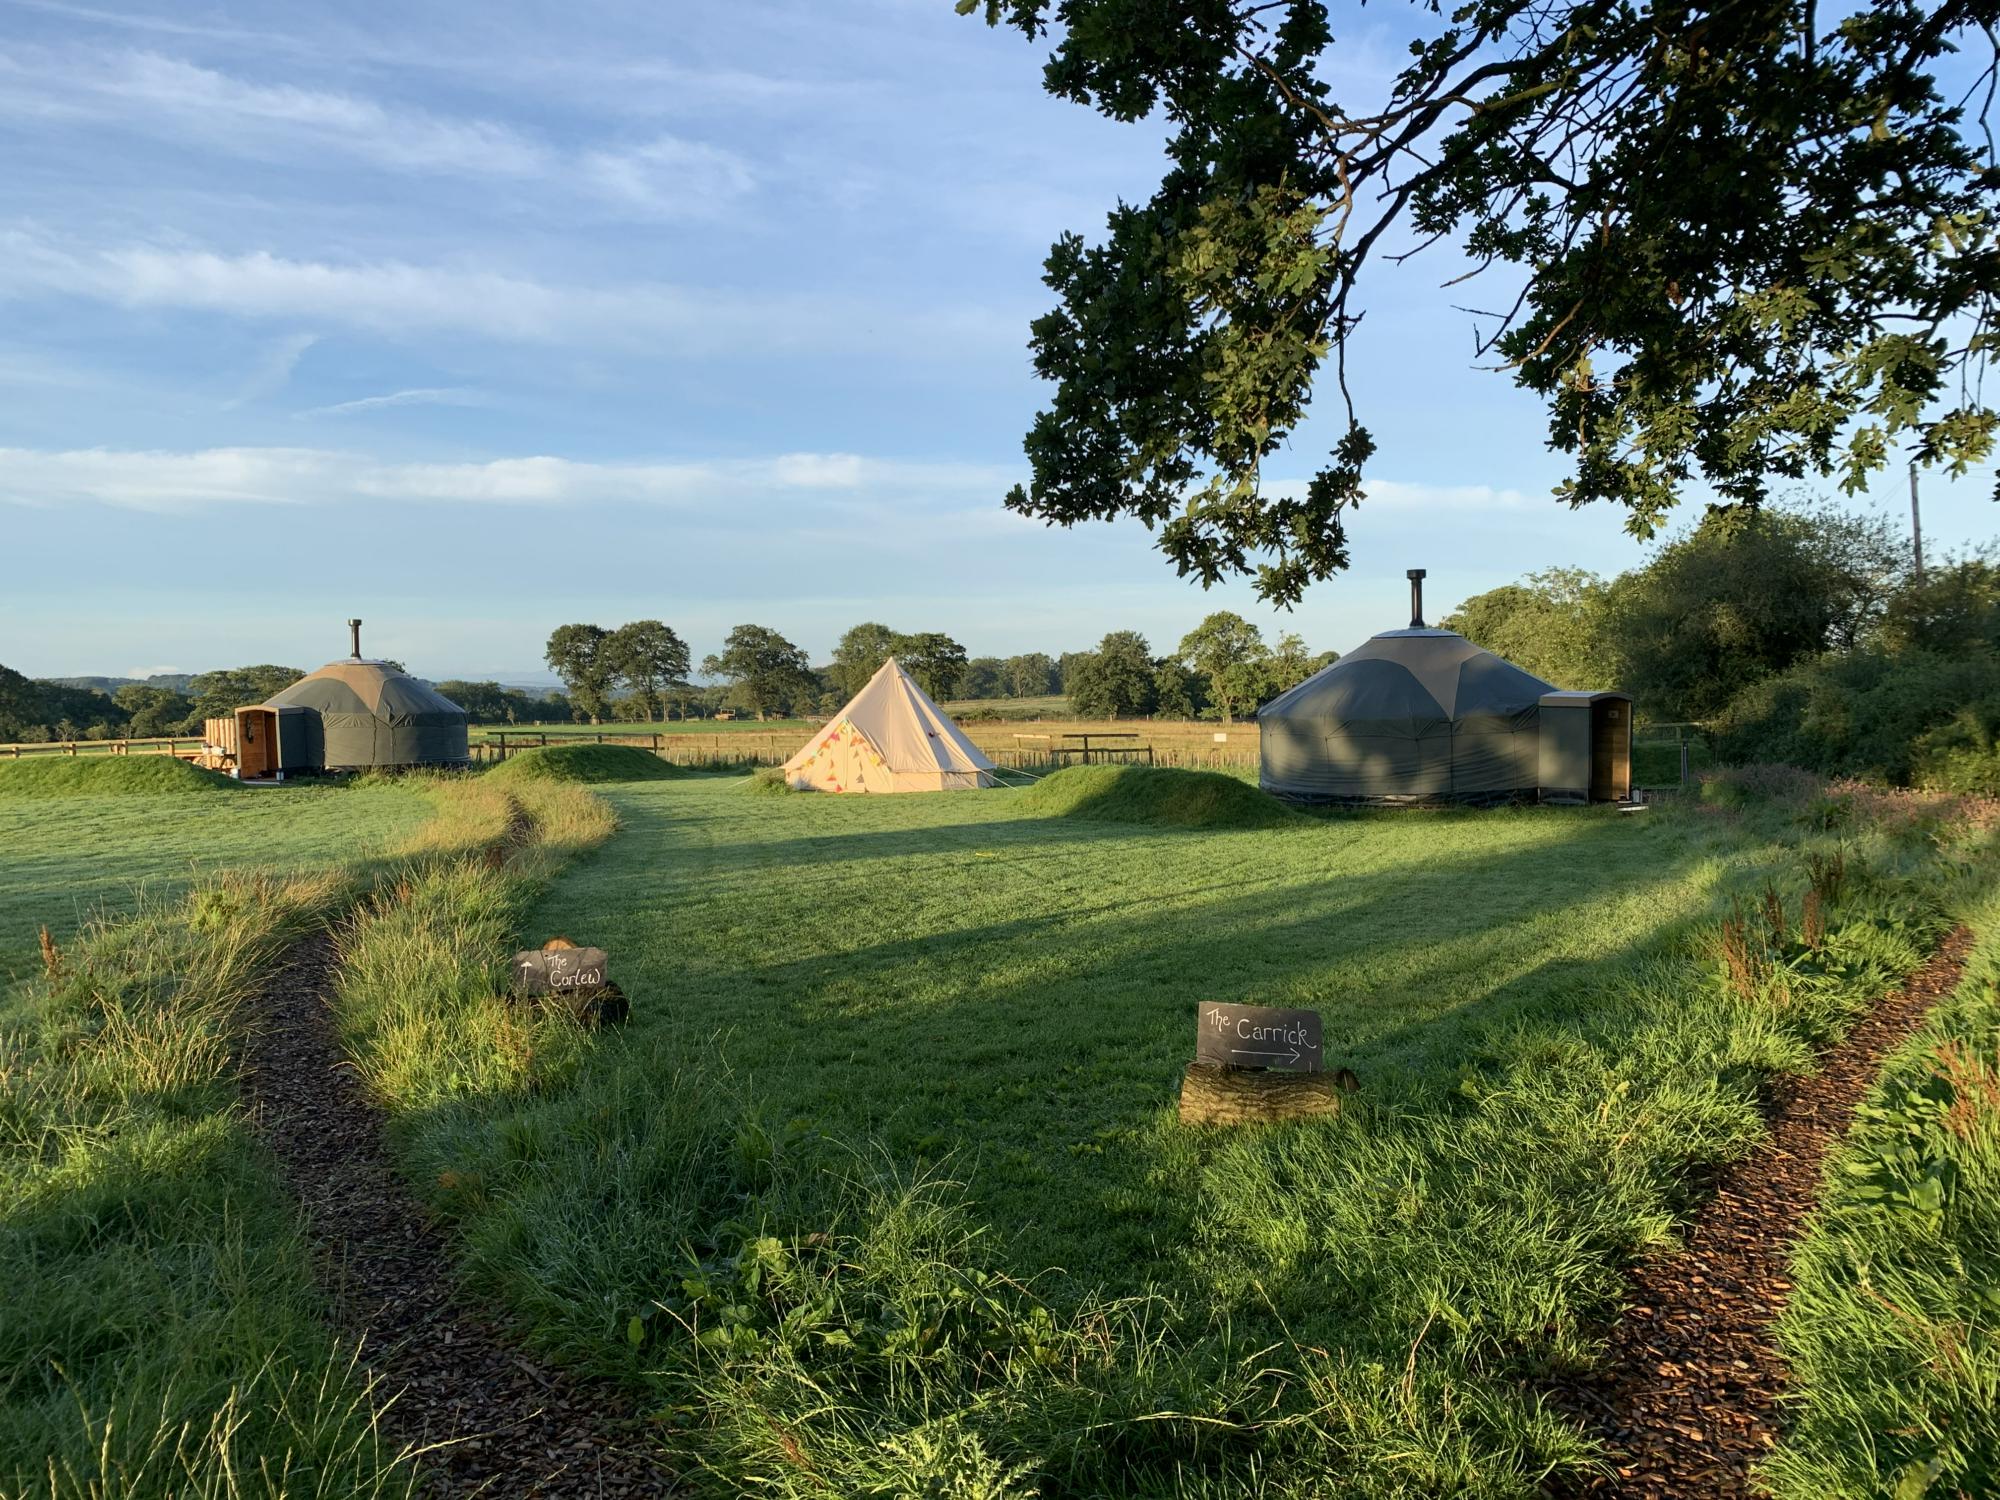 Campsites in Carlisle – Cool Camping